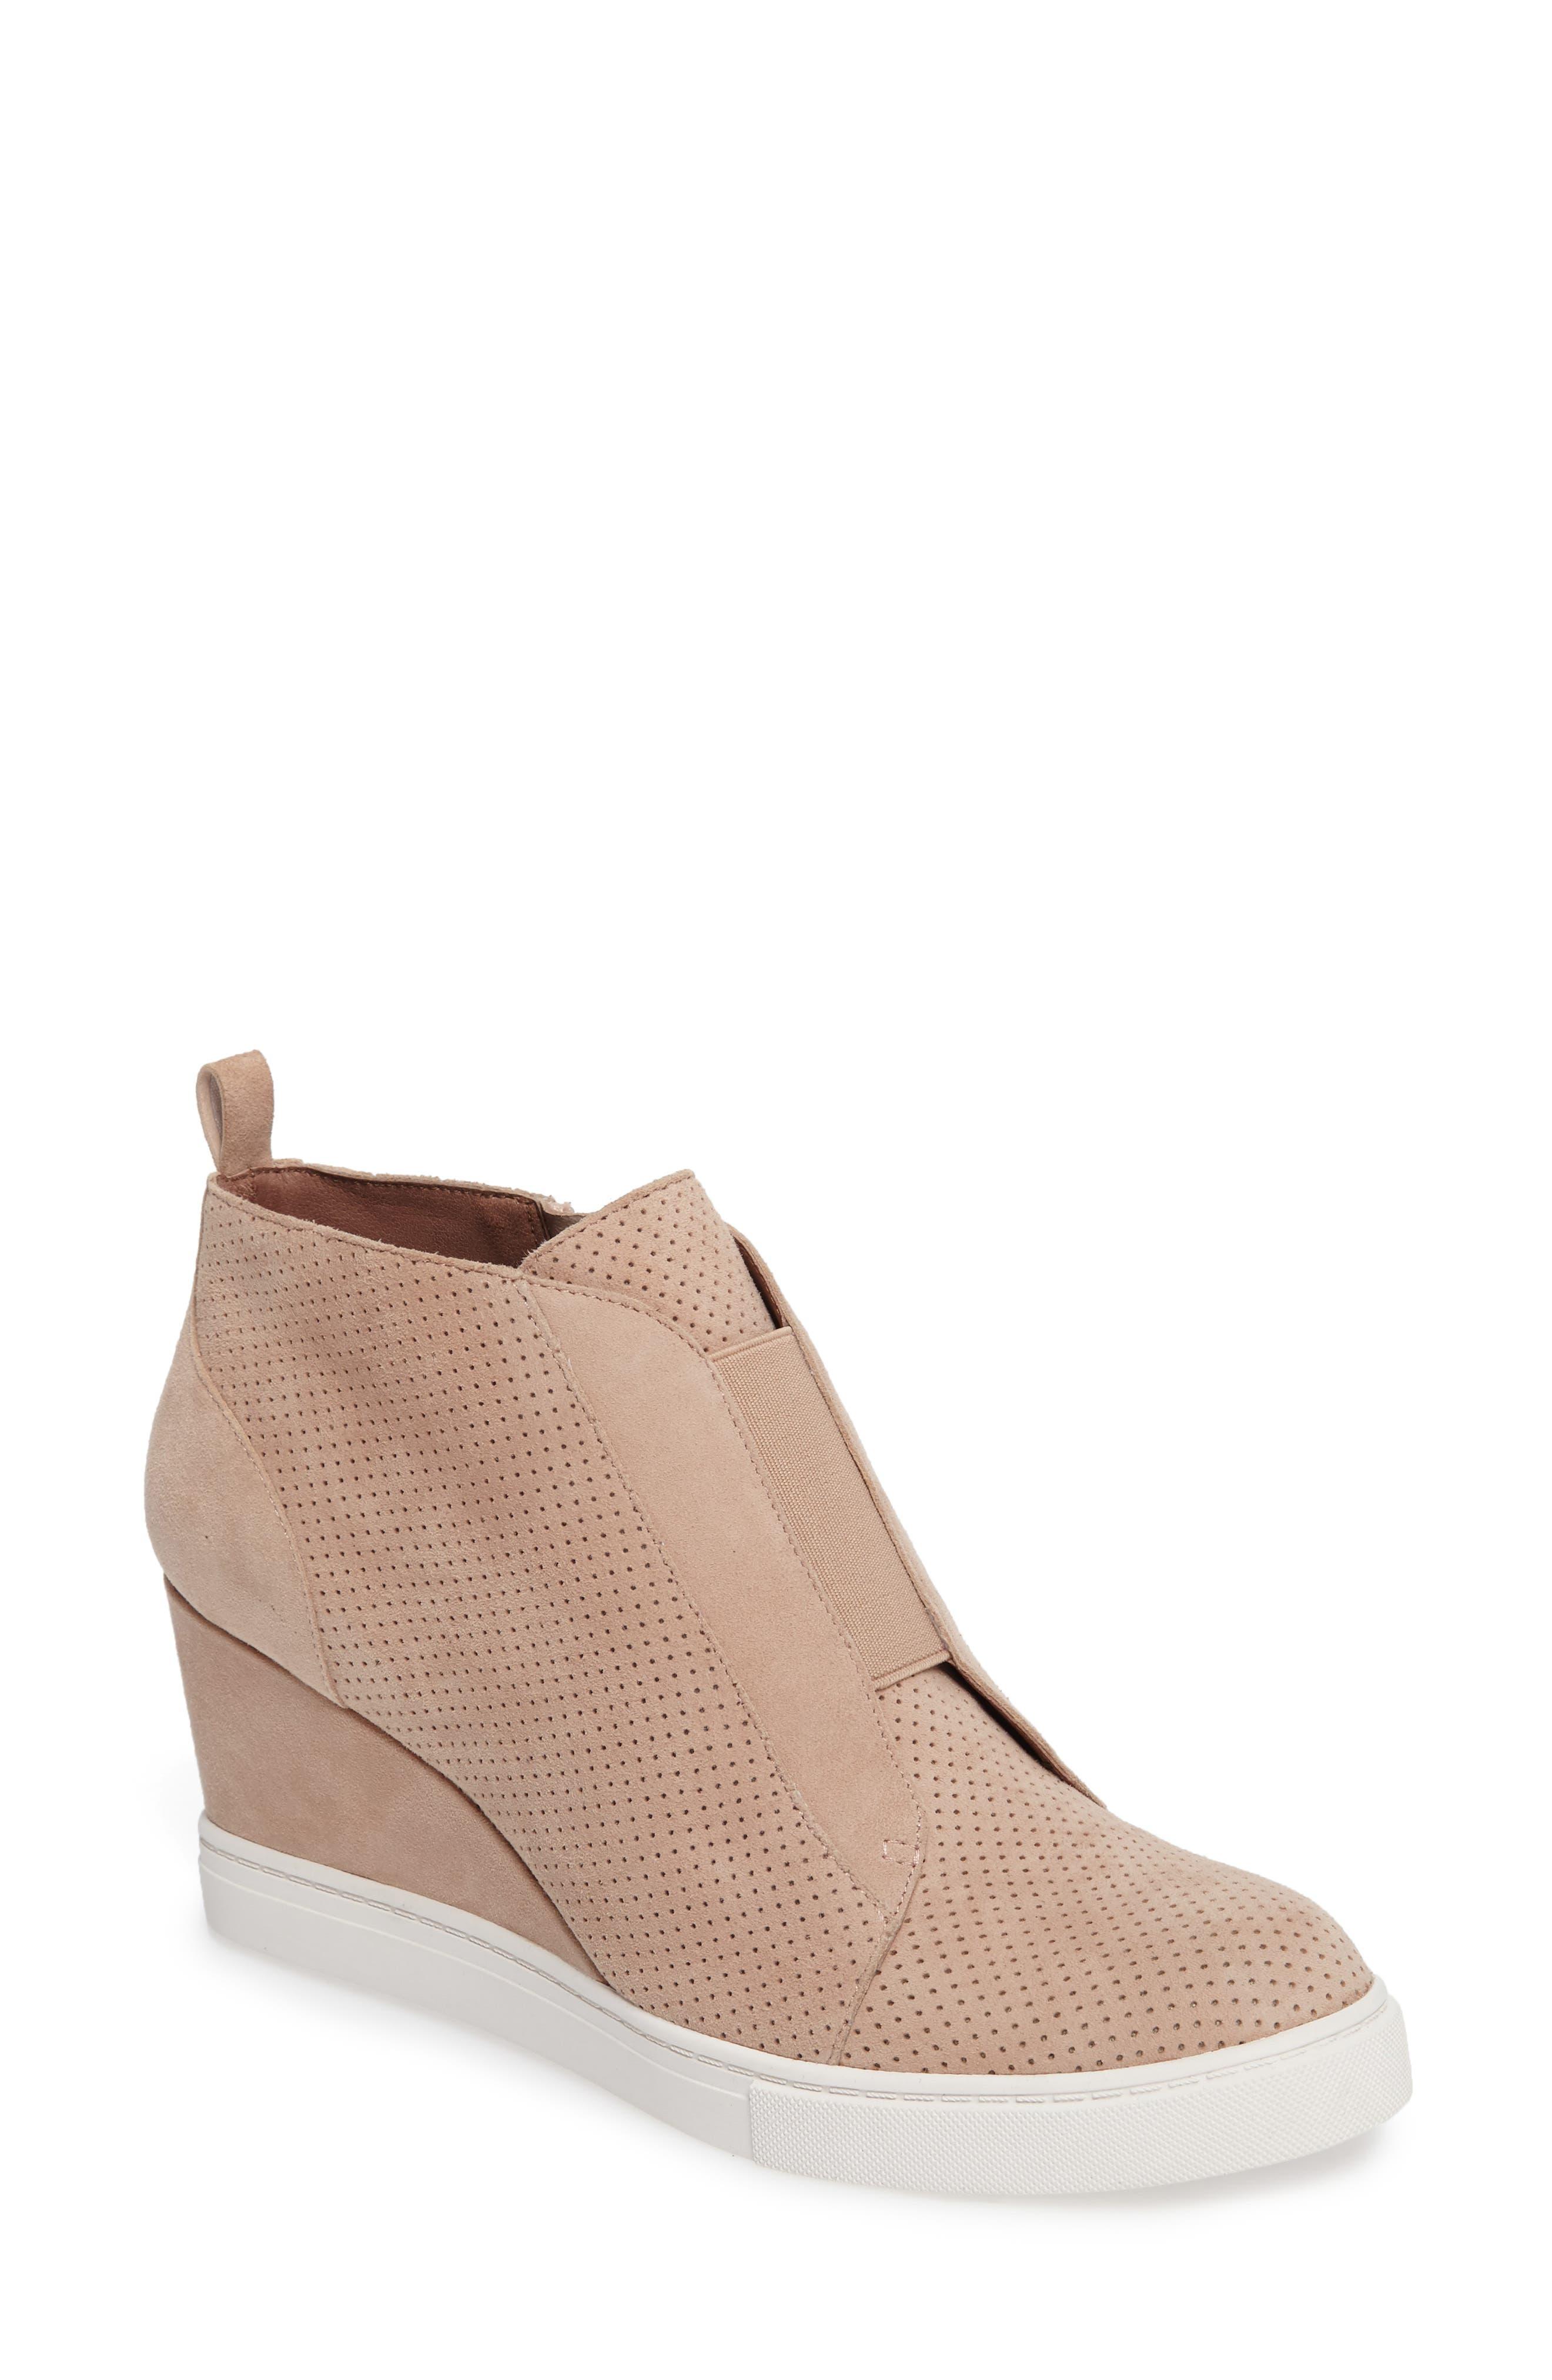 585a1dd8b57 Women s Linea Paolo Shoes